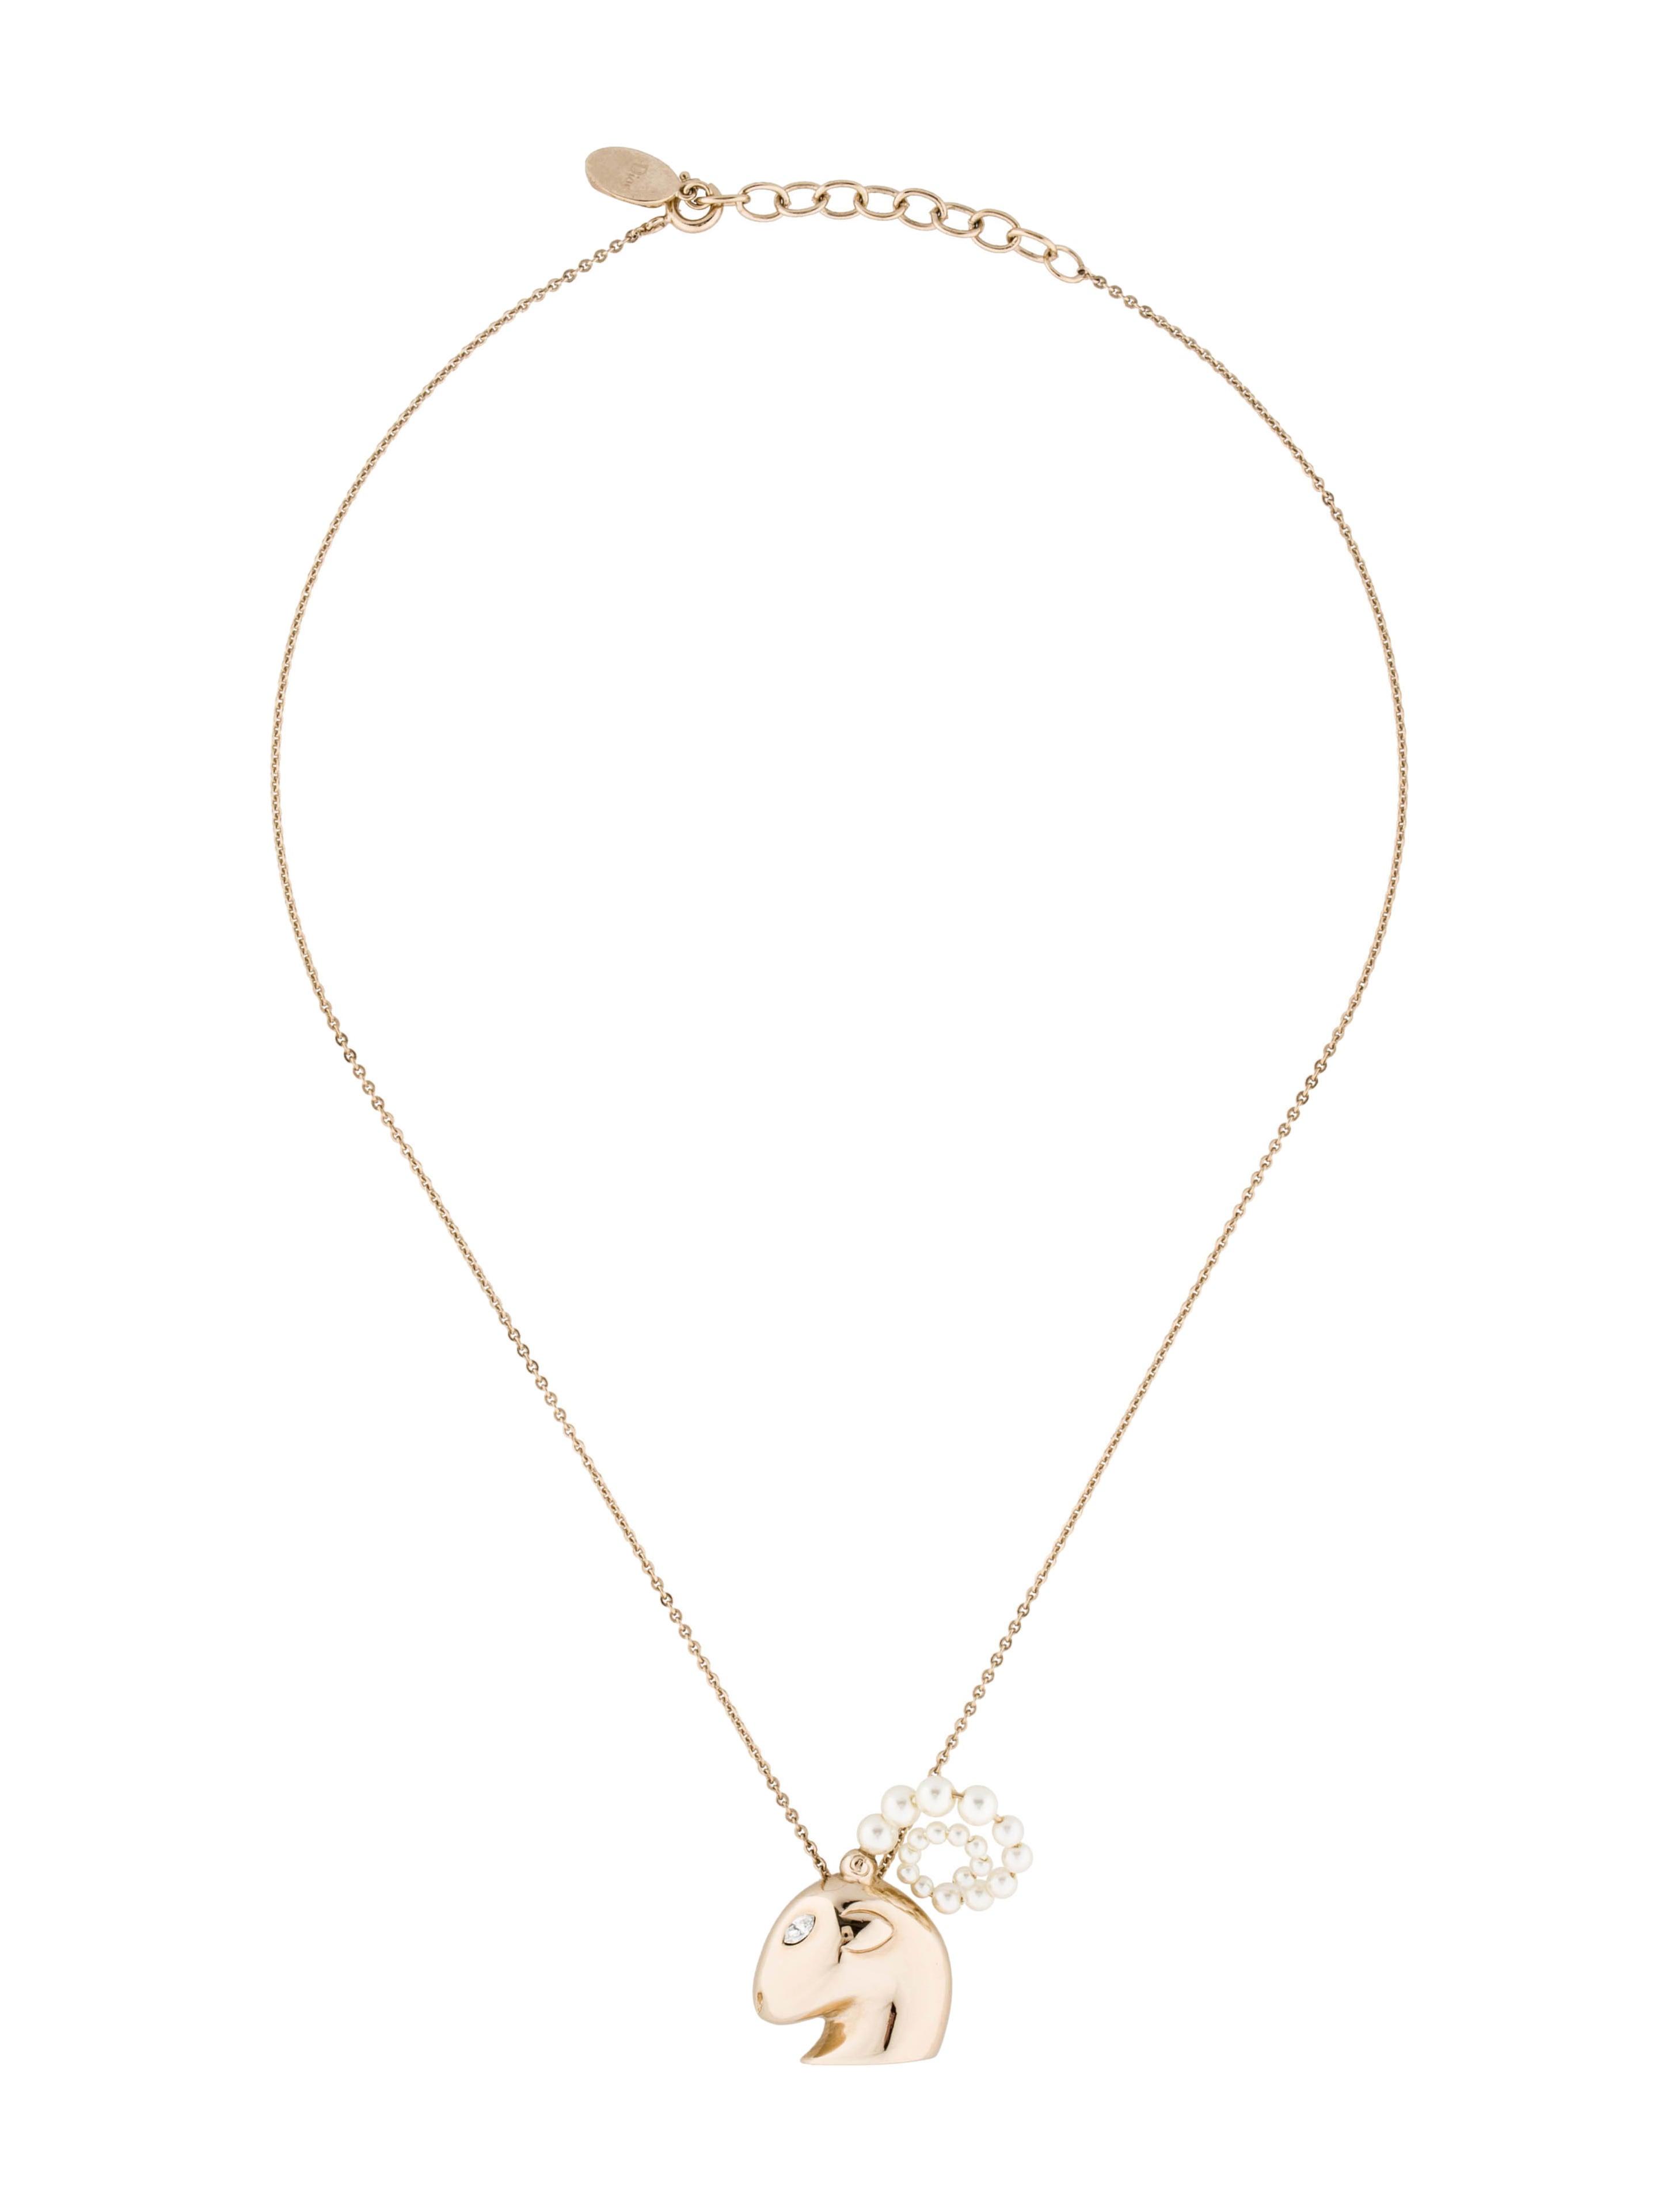 Christian dior tell me dior capricorn pendant necklace necklaces tell me dior capricorn pendant necklace aloadofball Choice Image